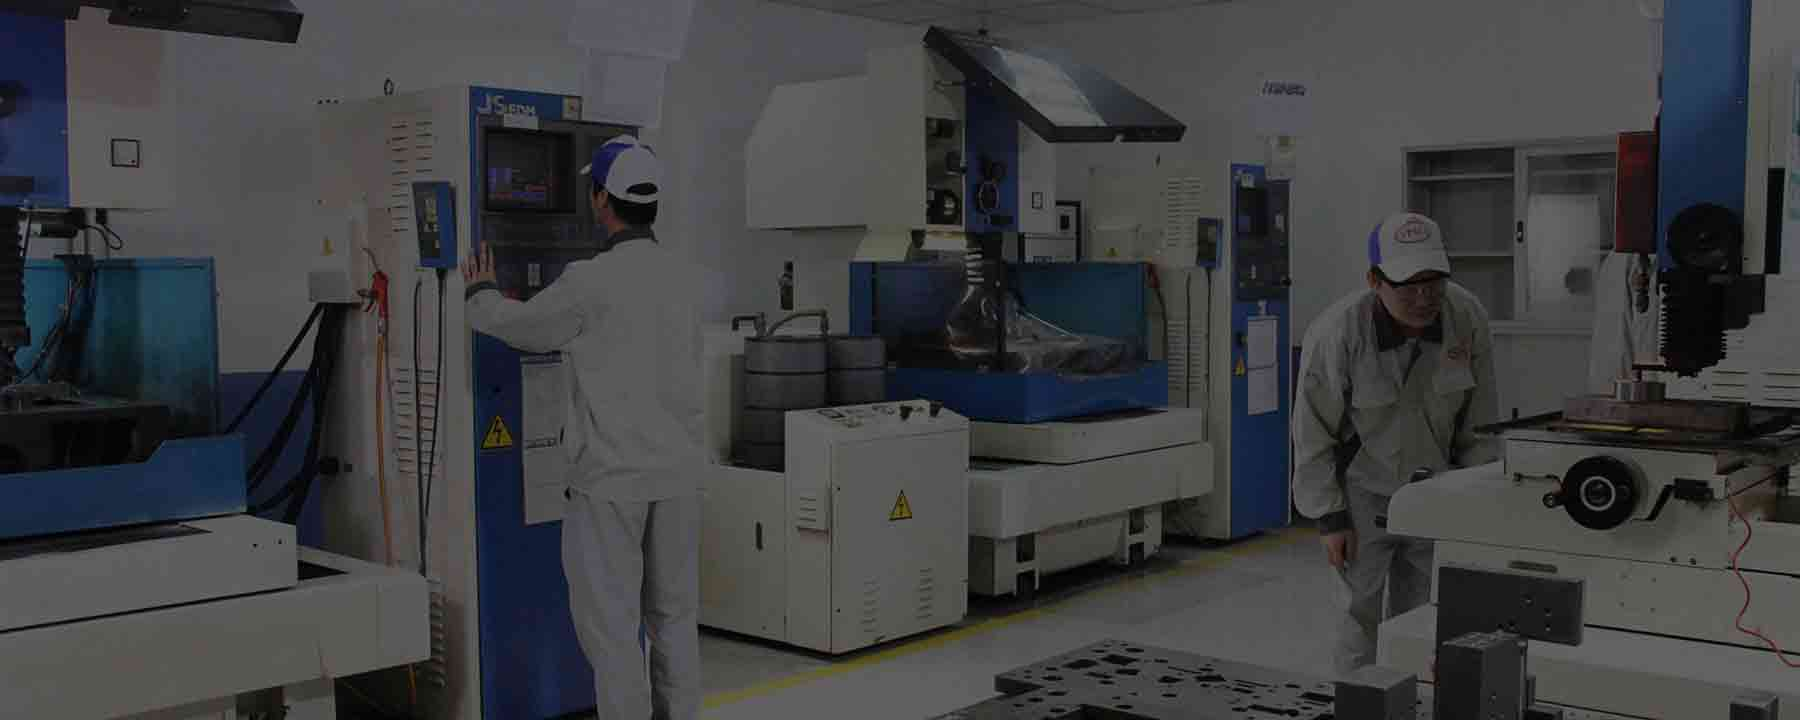 4000x2000_模具廠6-線切割機&放電機